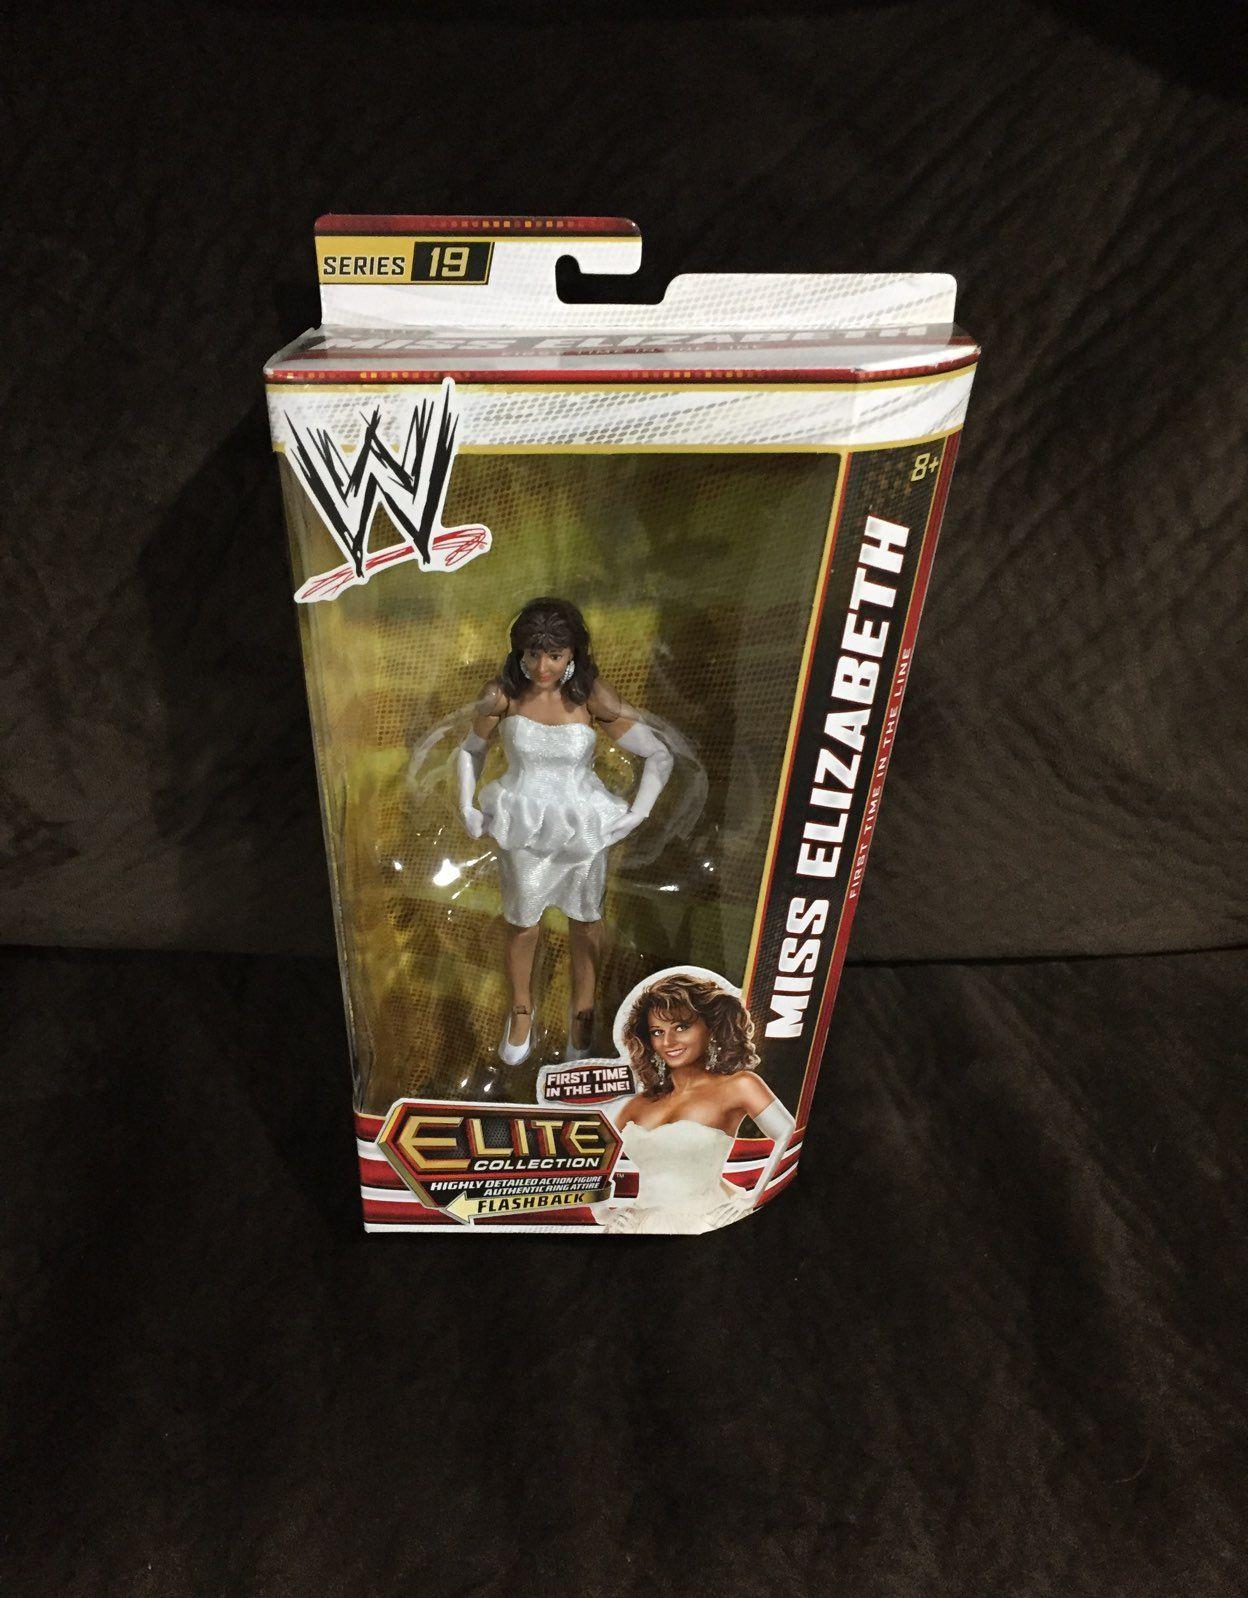 Cool item WWEWWF WRESTLING FIGURE Miss Elizabeth Stuff to buy